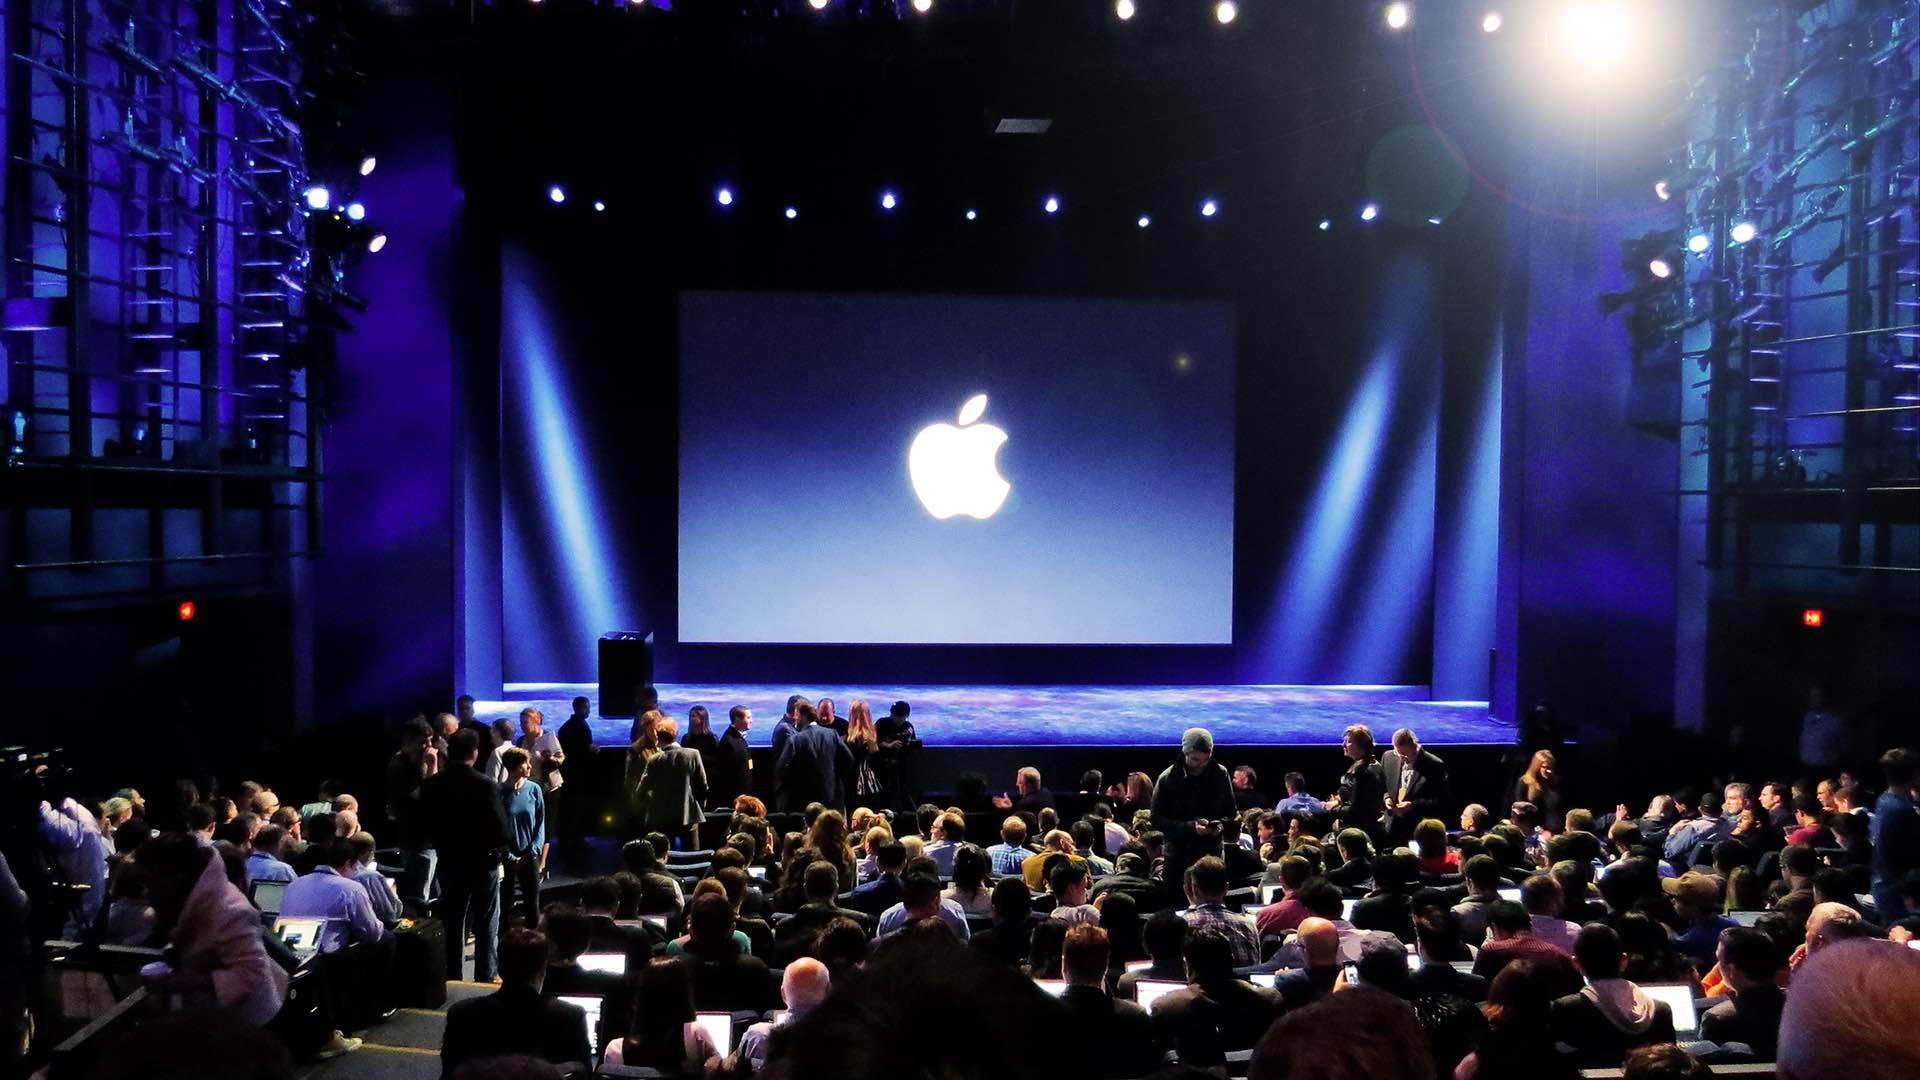 WWDC 2016: Apple presenta macOS Sierra, iOS 10, watchOS 3 e tvOS 10. Tutte le novità!